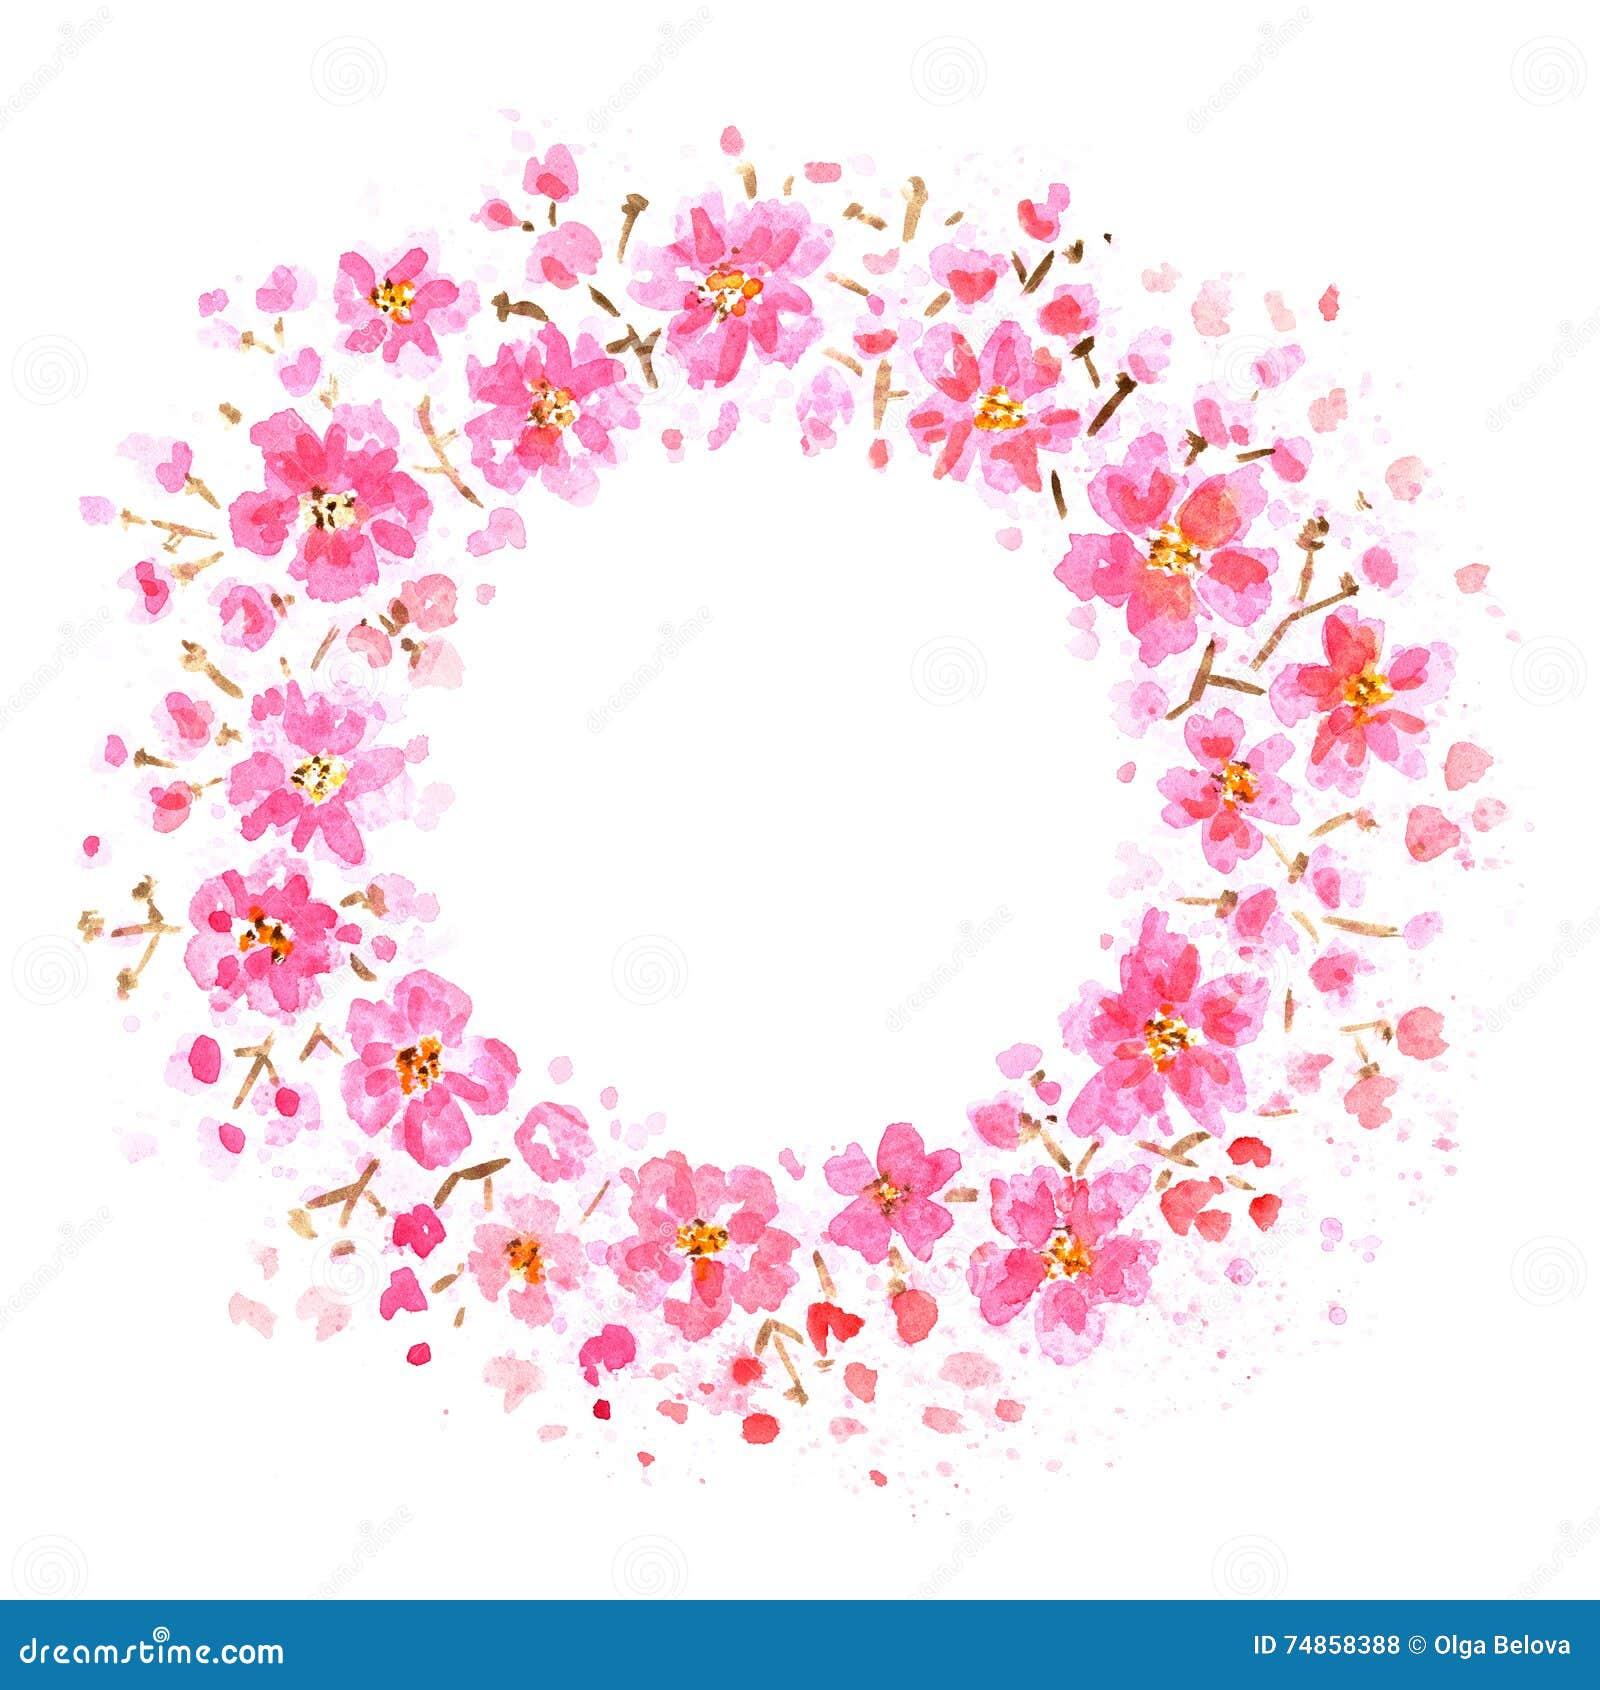 Pink flowers frame stock illustration illustration of wreath 74858388 pink flowers frame mightylinksfo